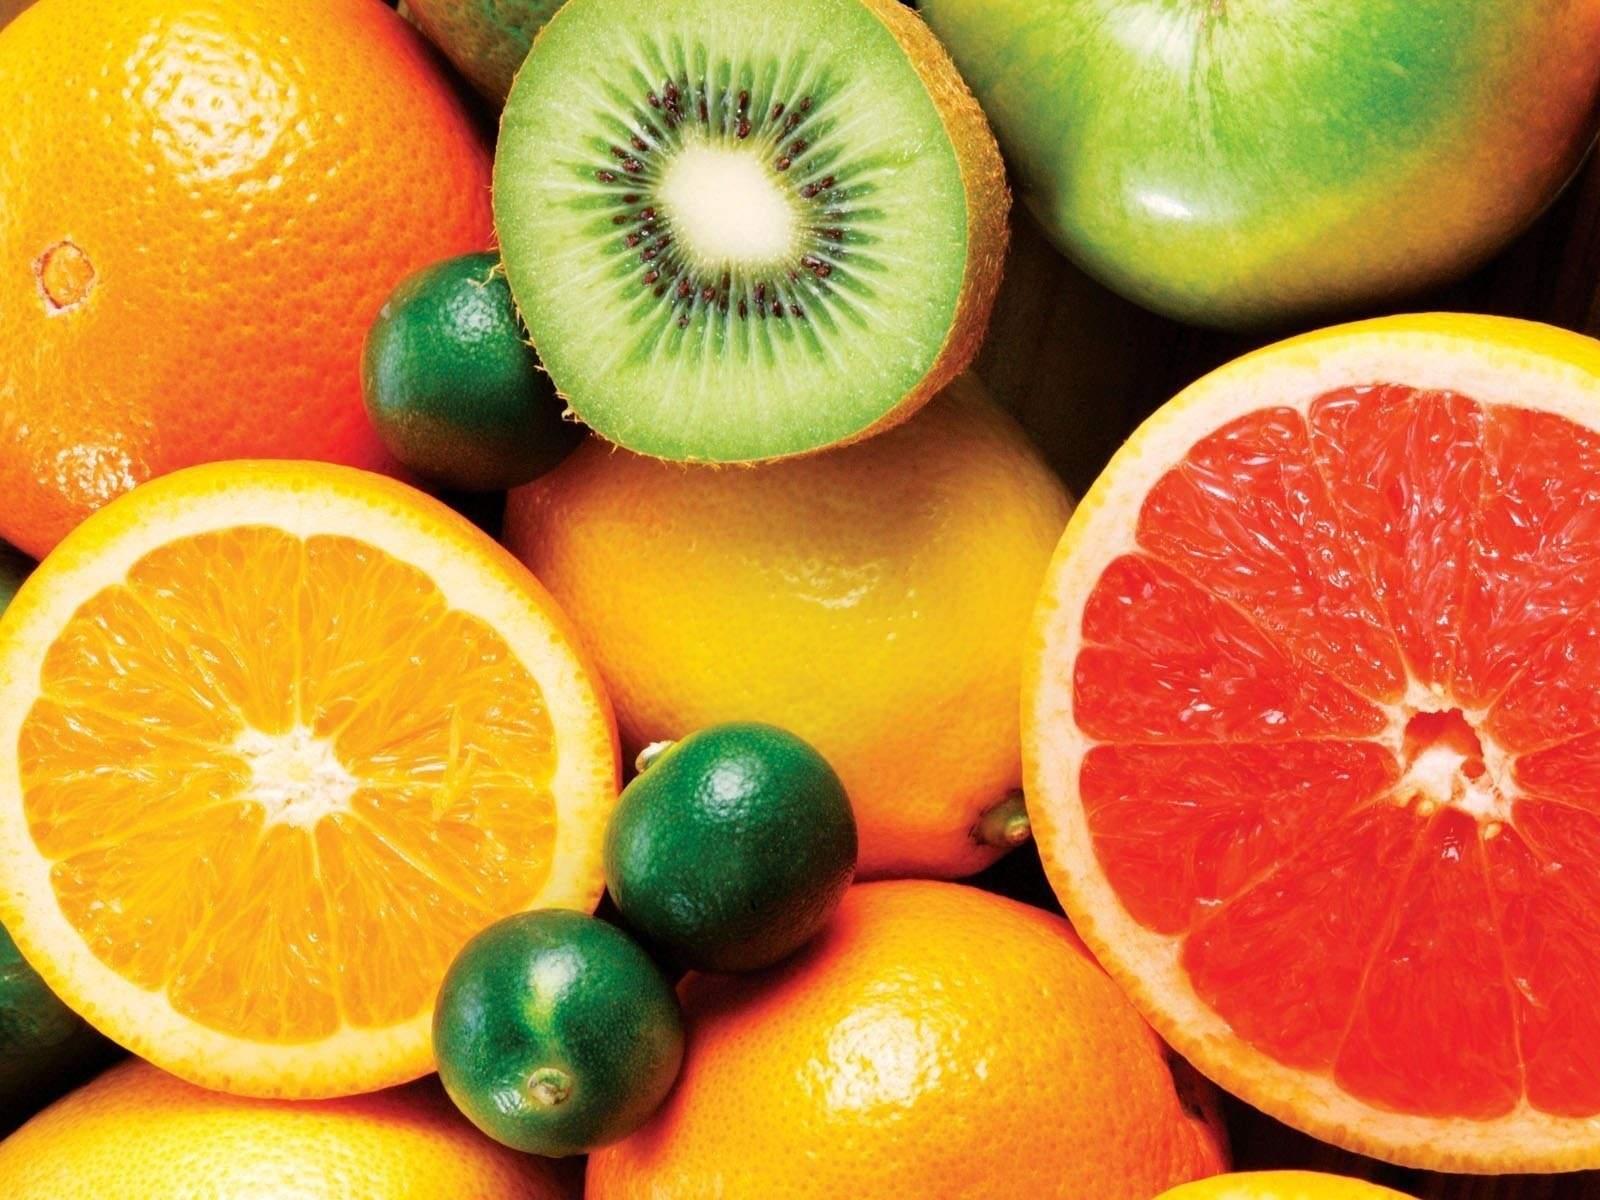 http://4.bp.blogspot.com/-BbL0J_UeYtQ/Tc-Rs7q3g2I/AAAAAAAAABQ/Acsv-GZB56k/s1600/Fruits-widescreen-HD-wallpapers-1600x1022-004.jpg